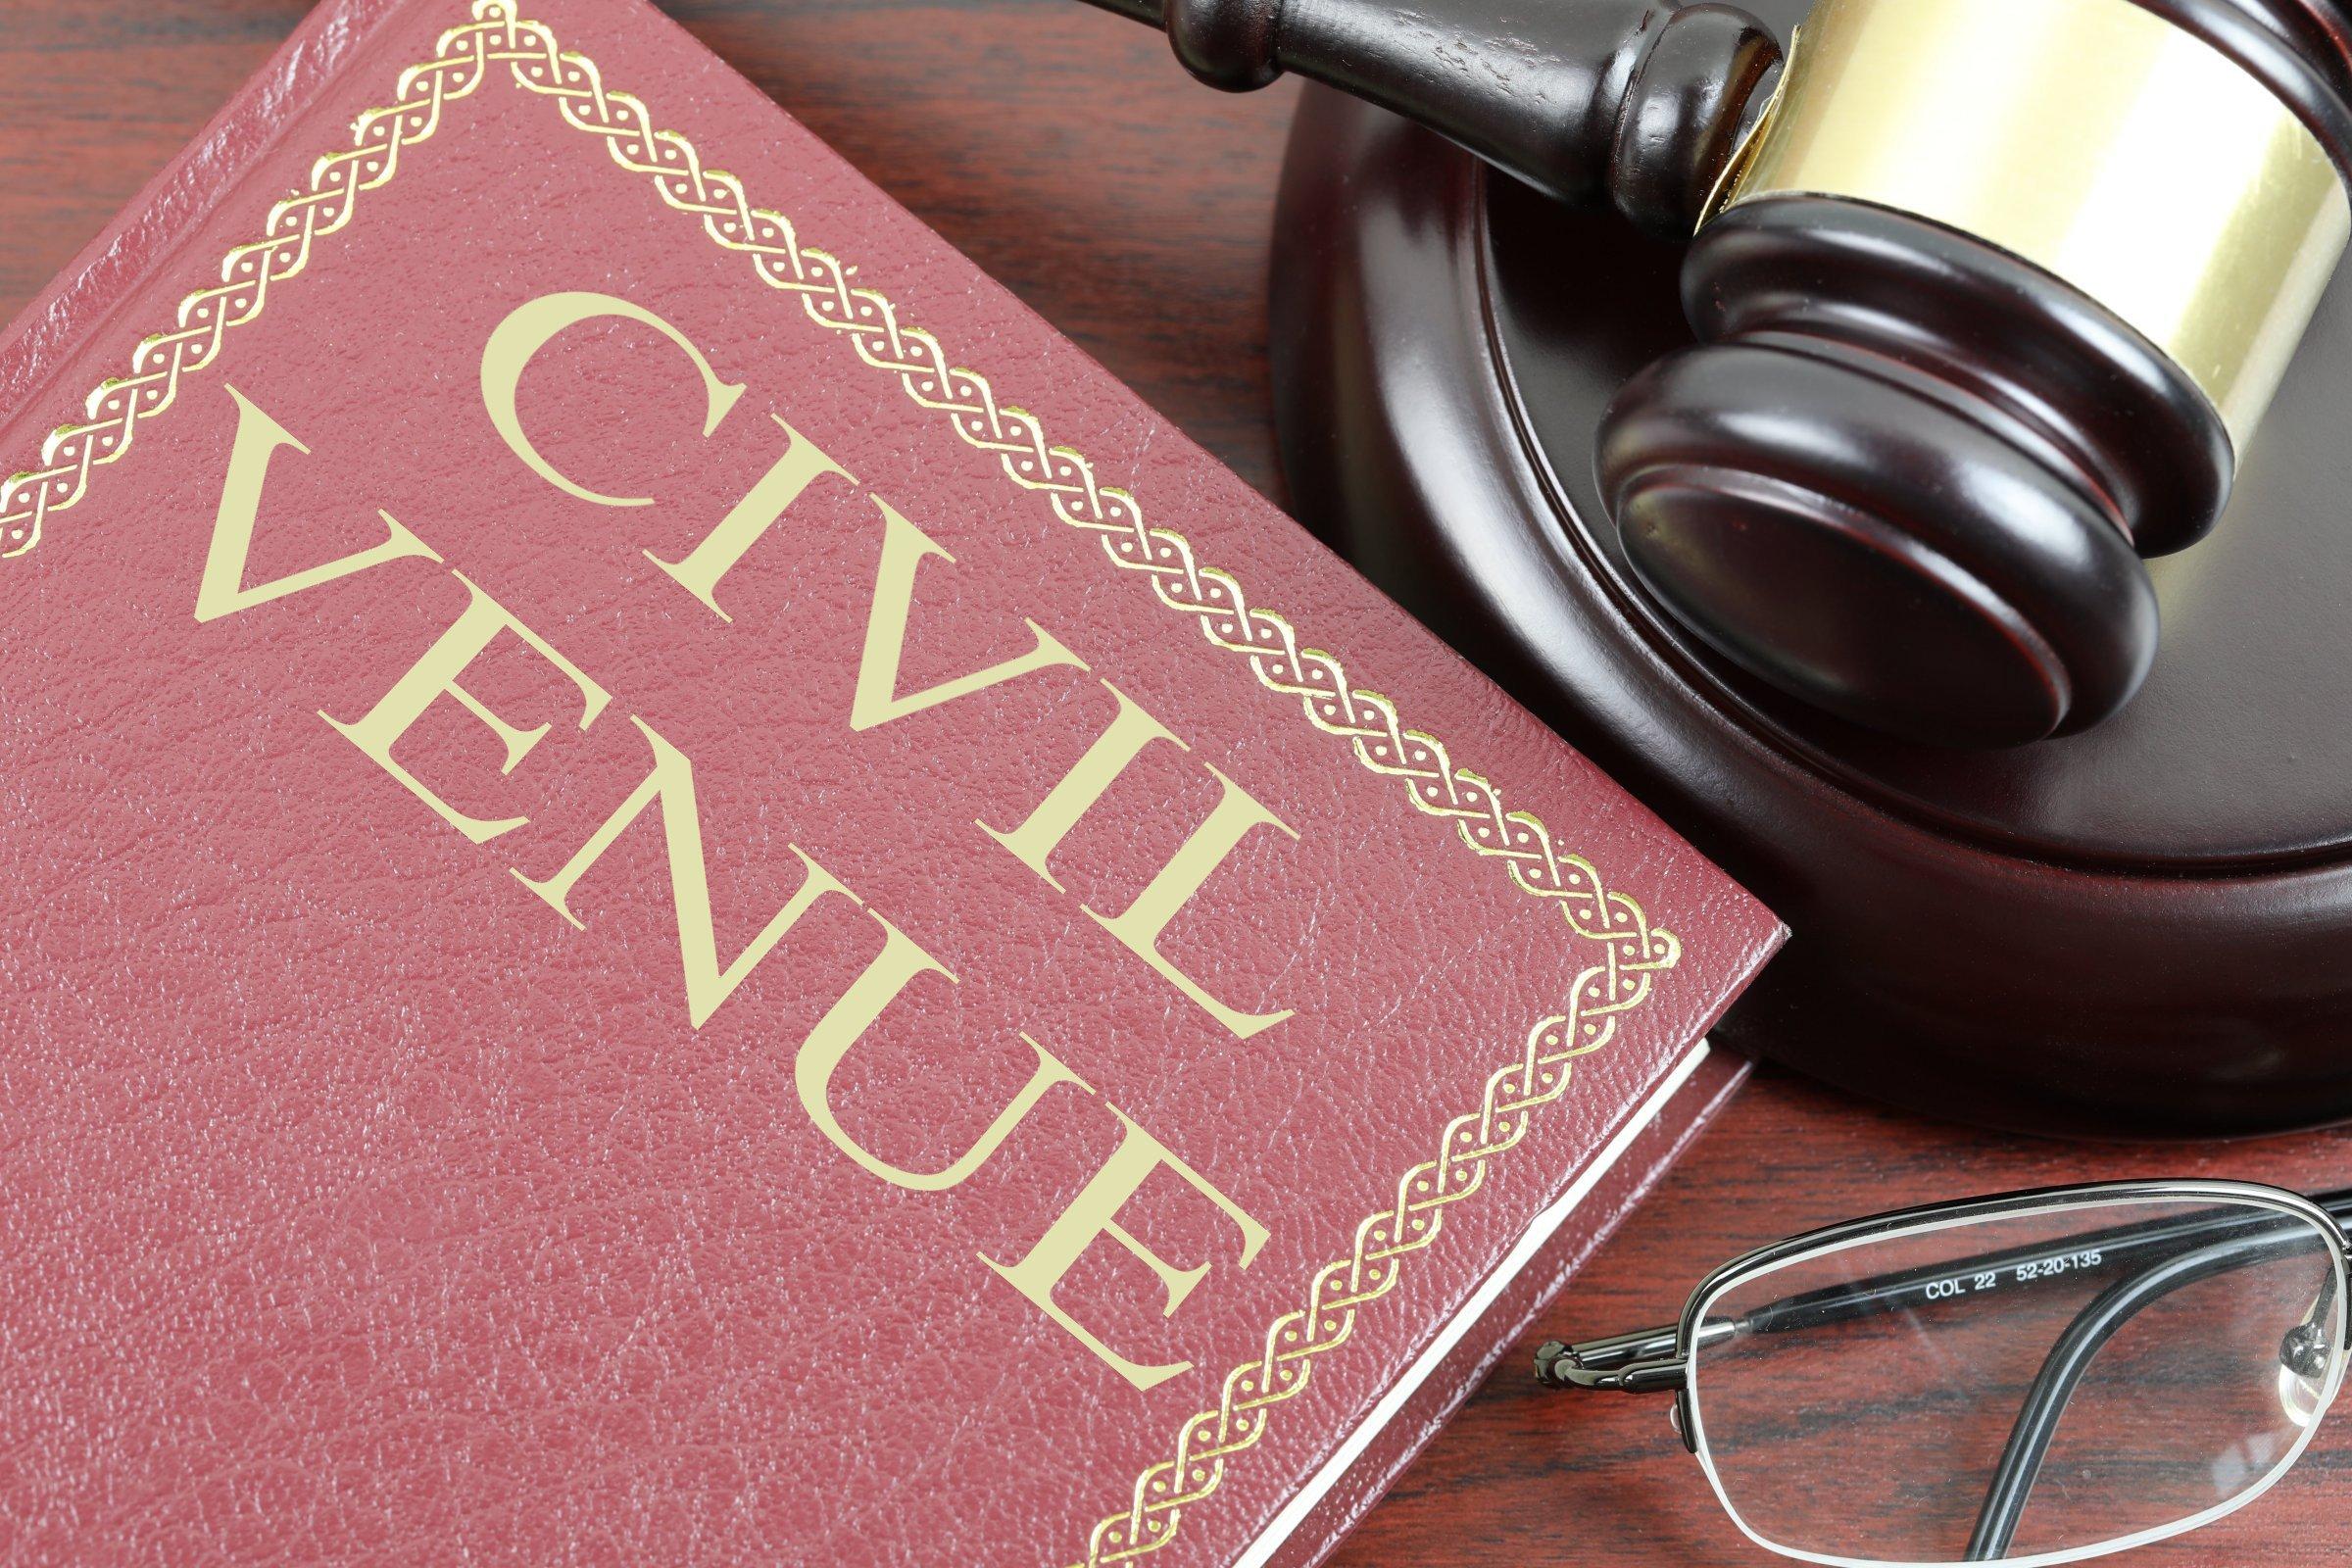 Civil Venue